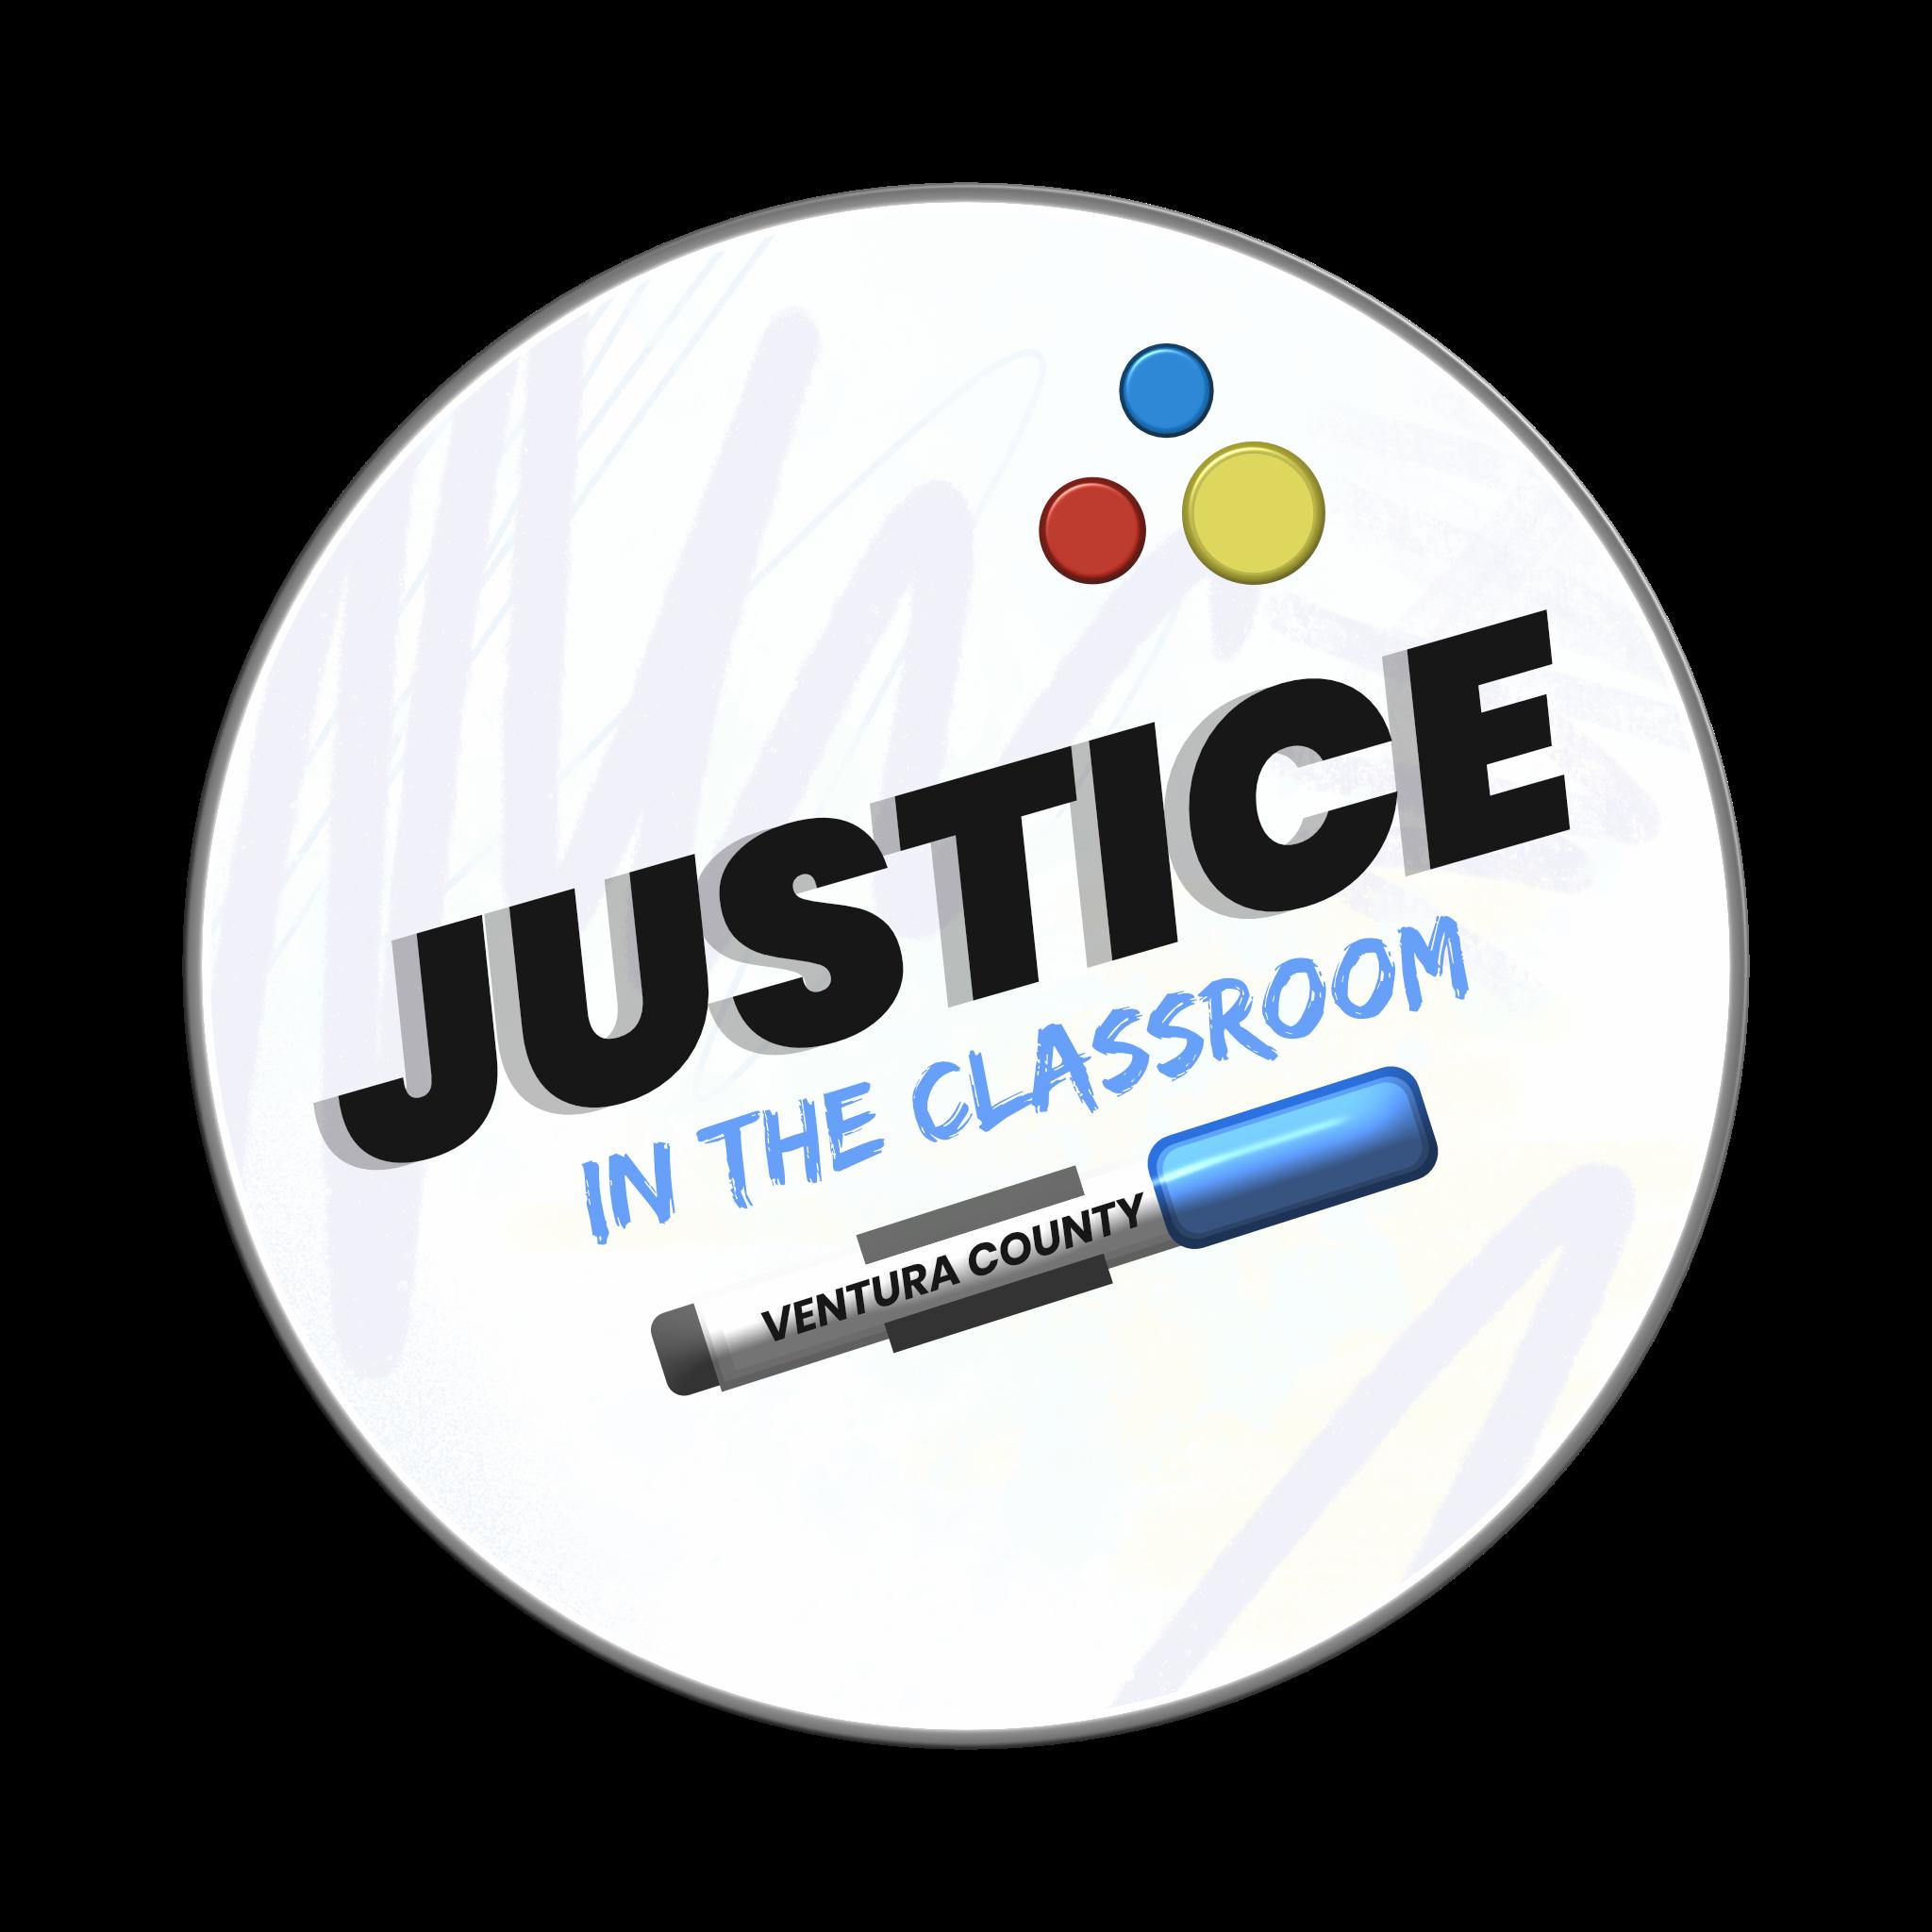 @justiceintheclassroom Profile Image | Linktree